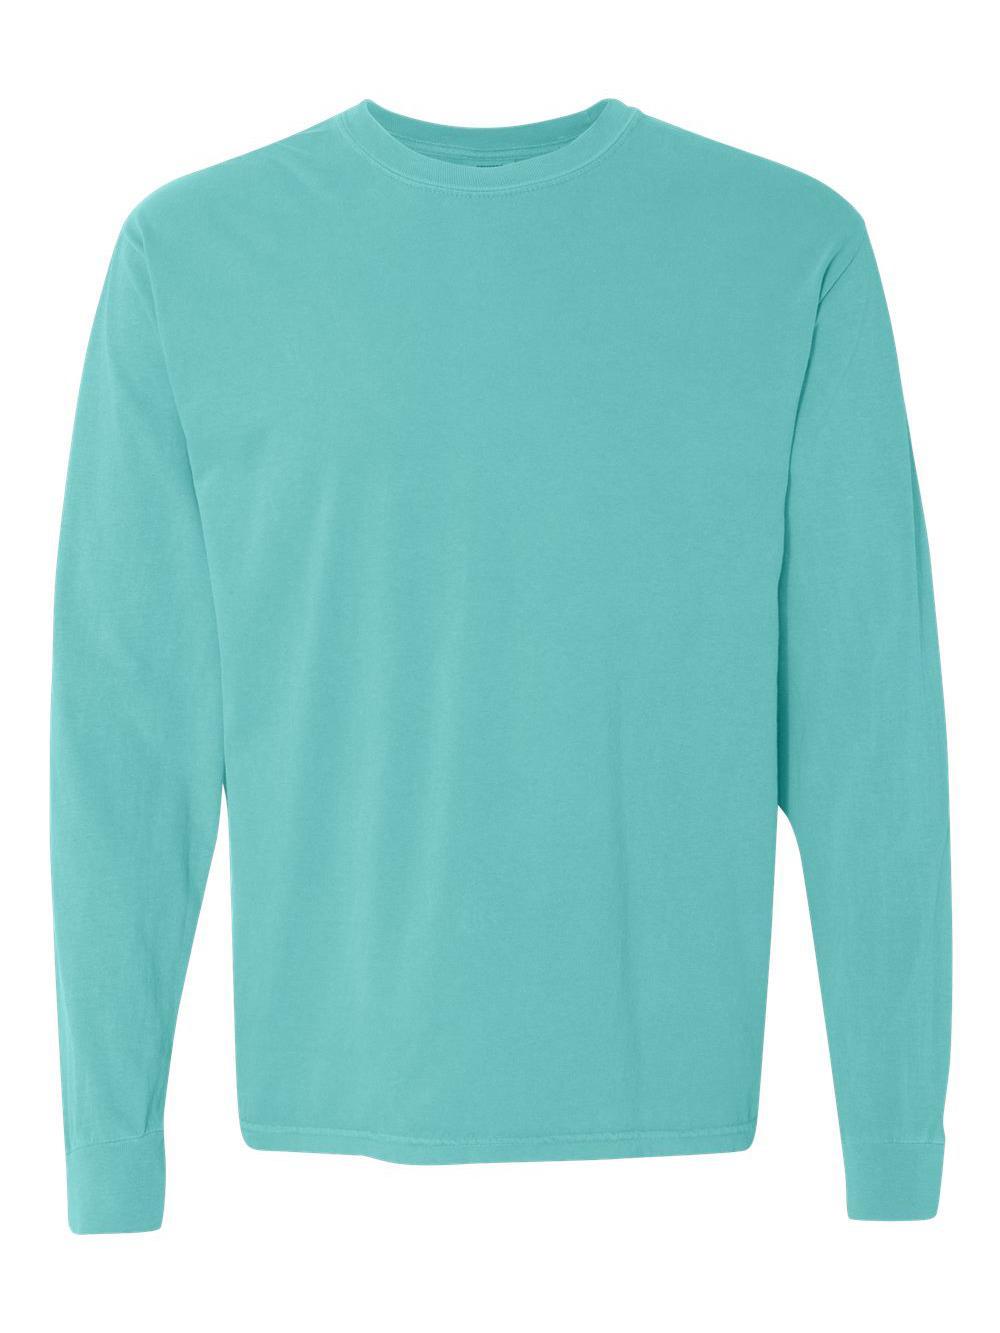 Comfort-Colors-Garment-Dyed-Heavyweight-Ringspun-Long-Sleeve-T-Shirt-6014 thumbnail 45